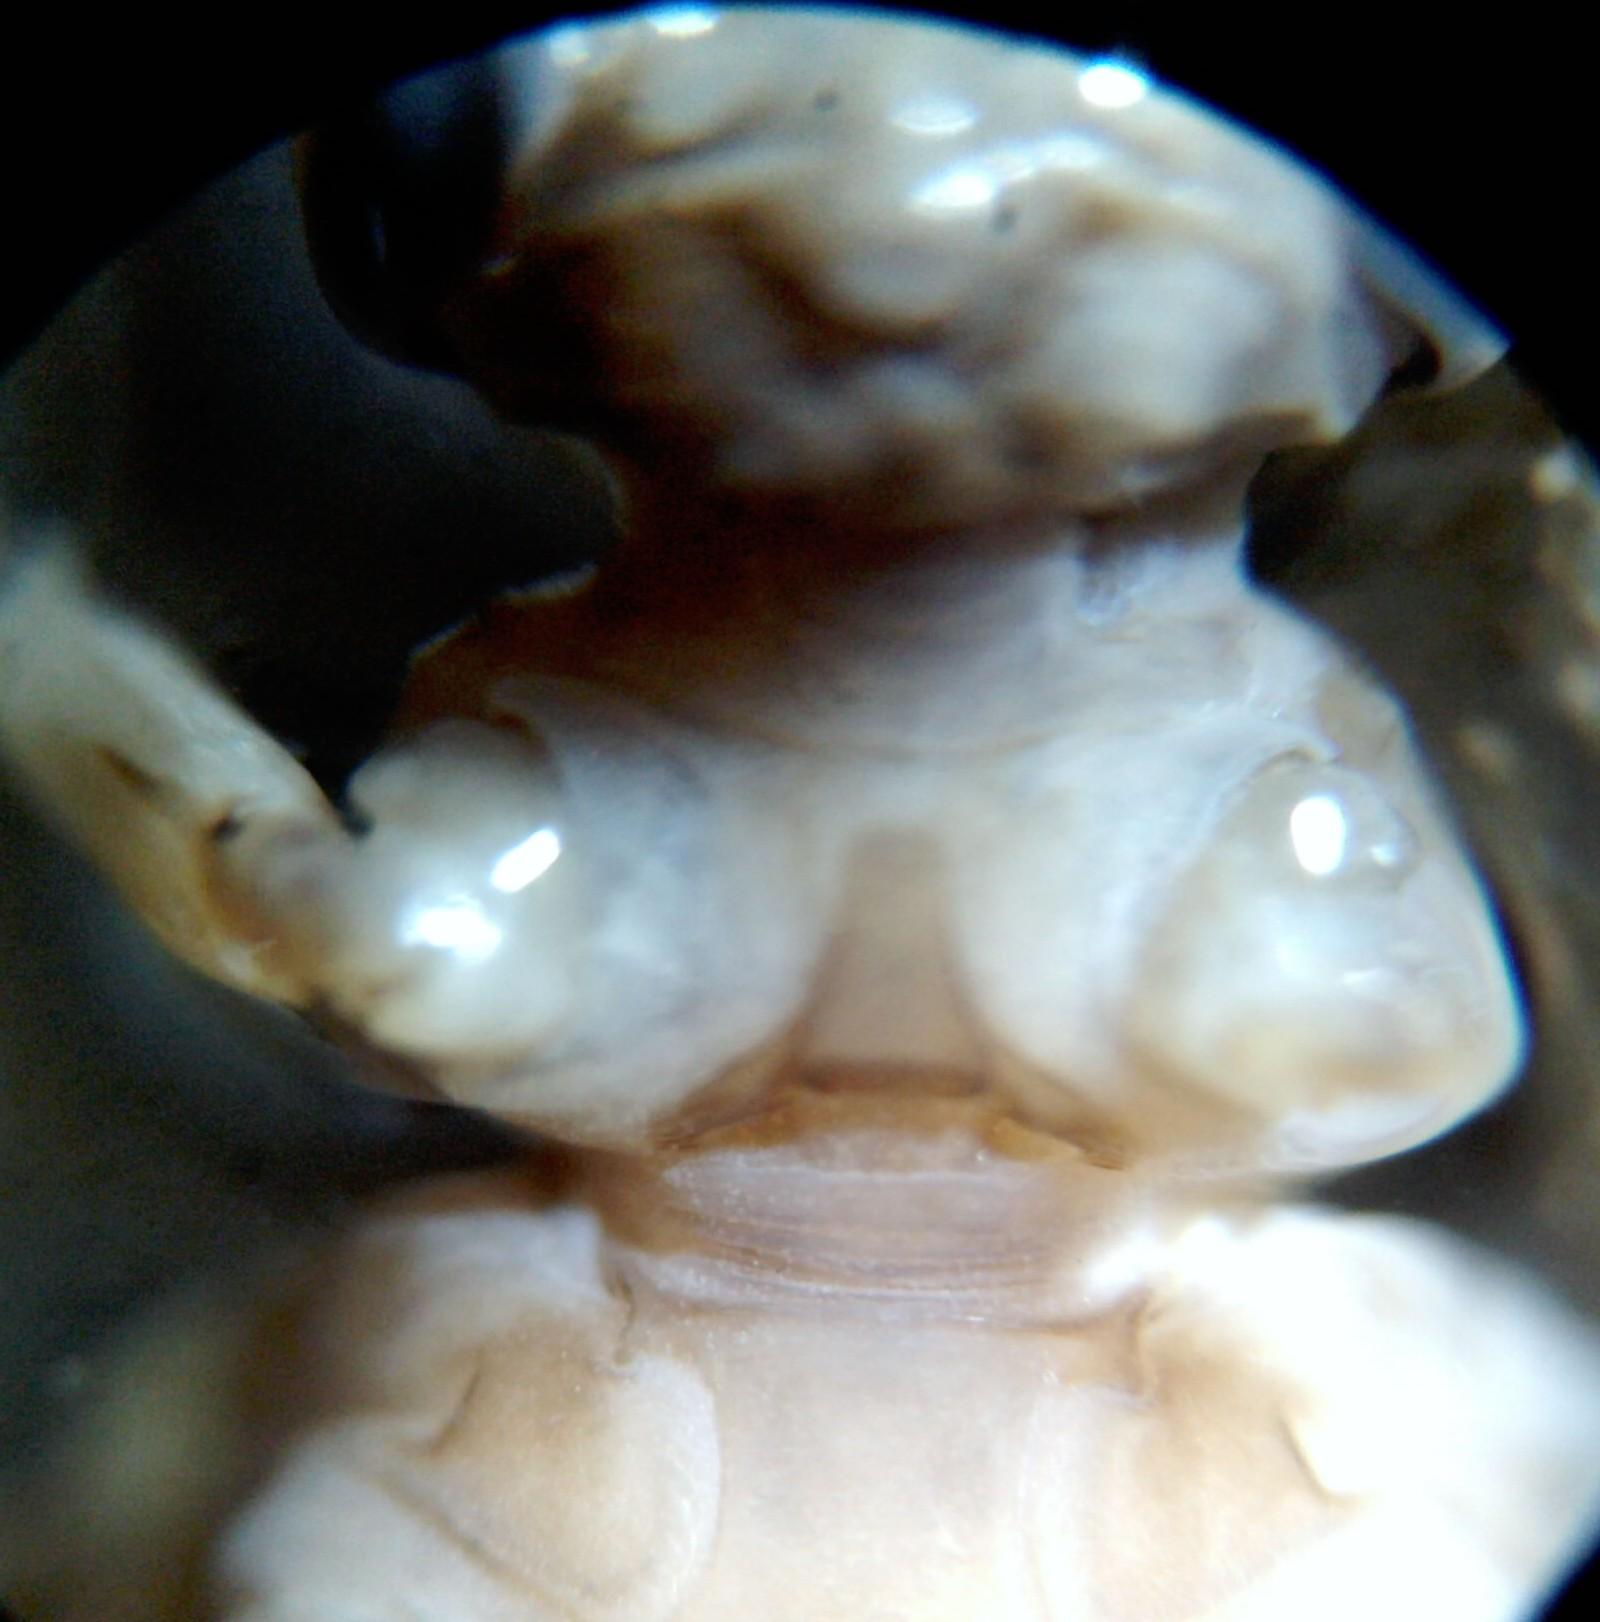 ventral prothorax